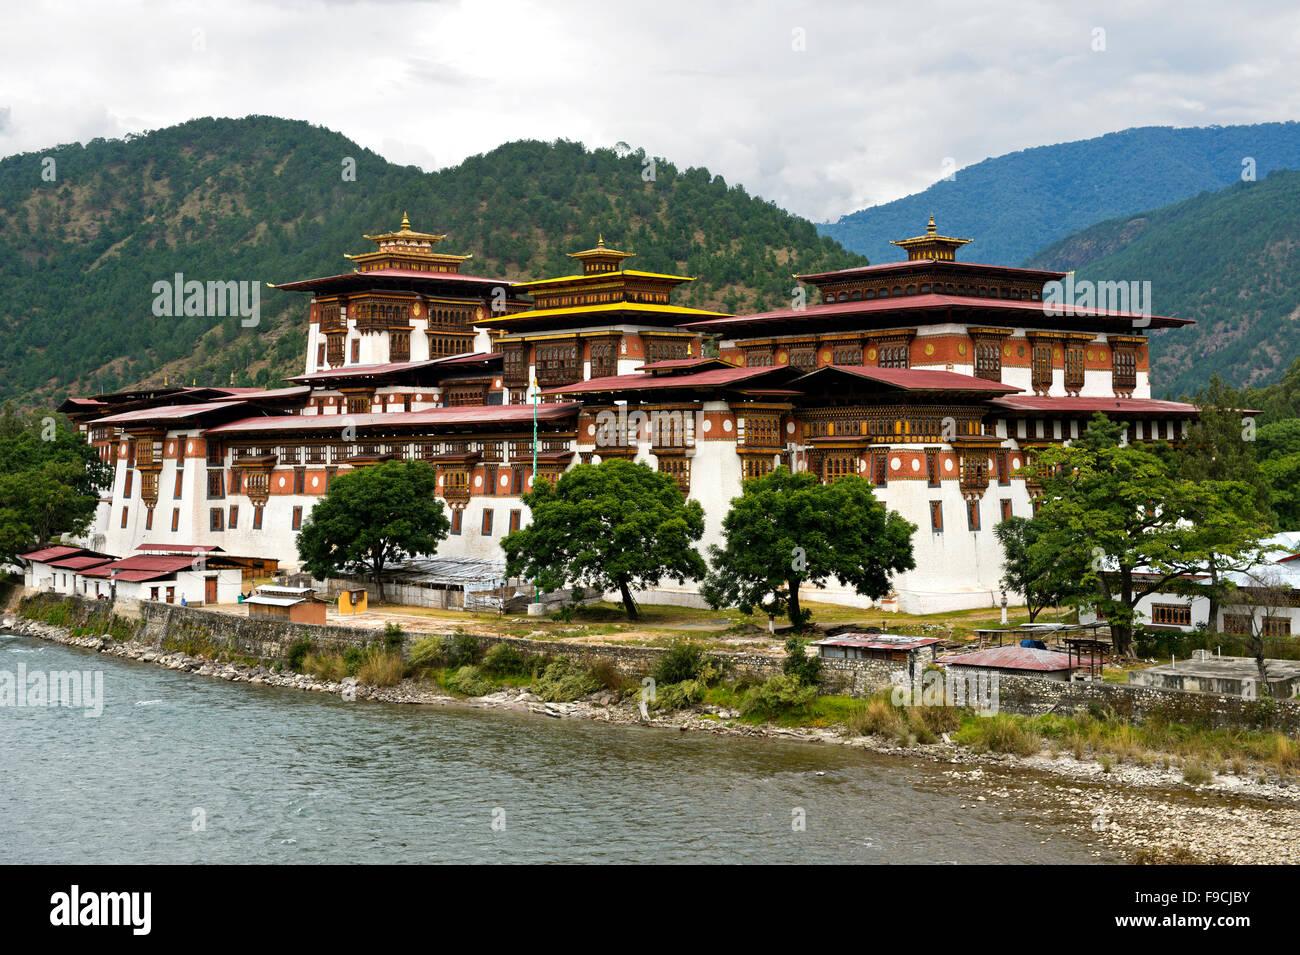 Monastery and fortress Punakha Dzong, Punakah, Bhutan - Stock Image